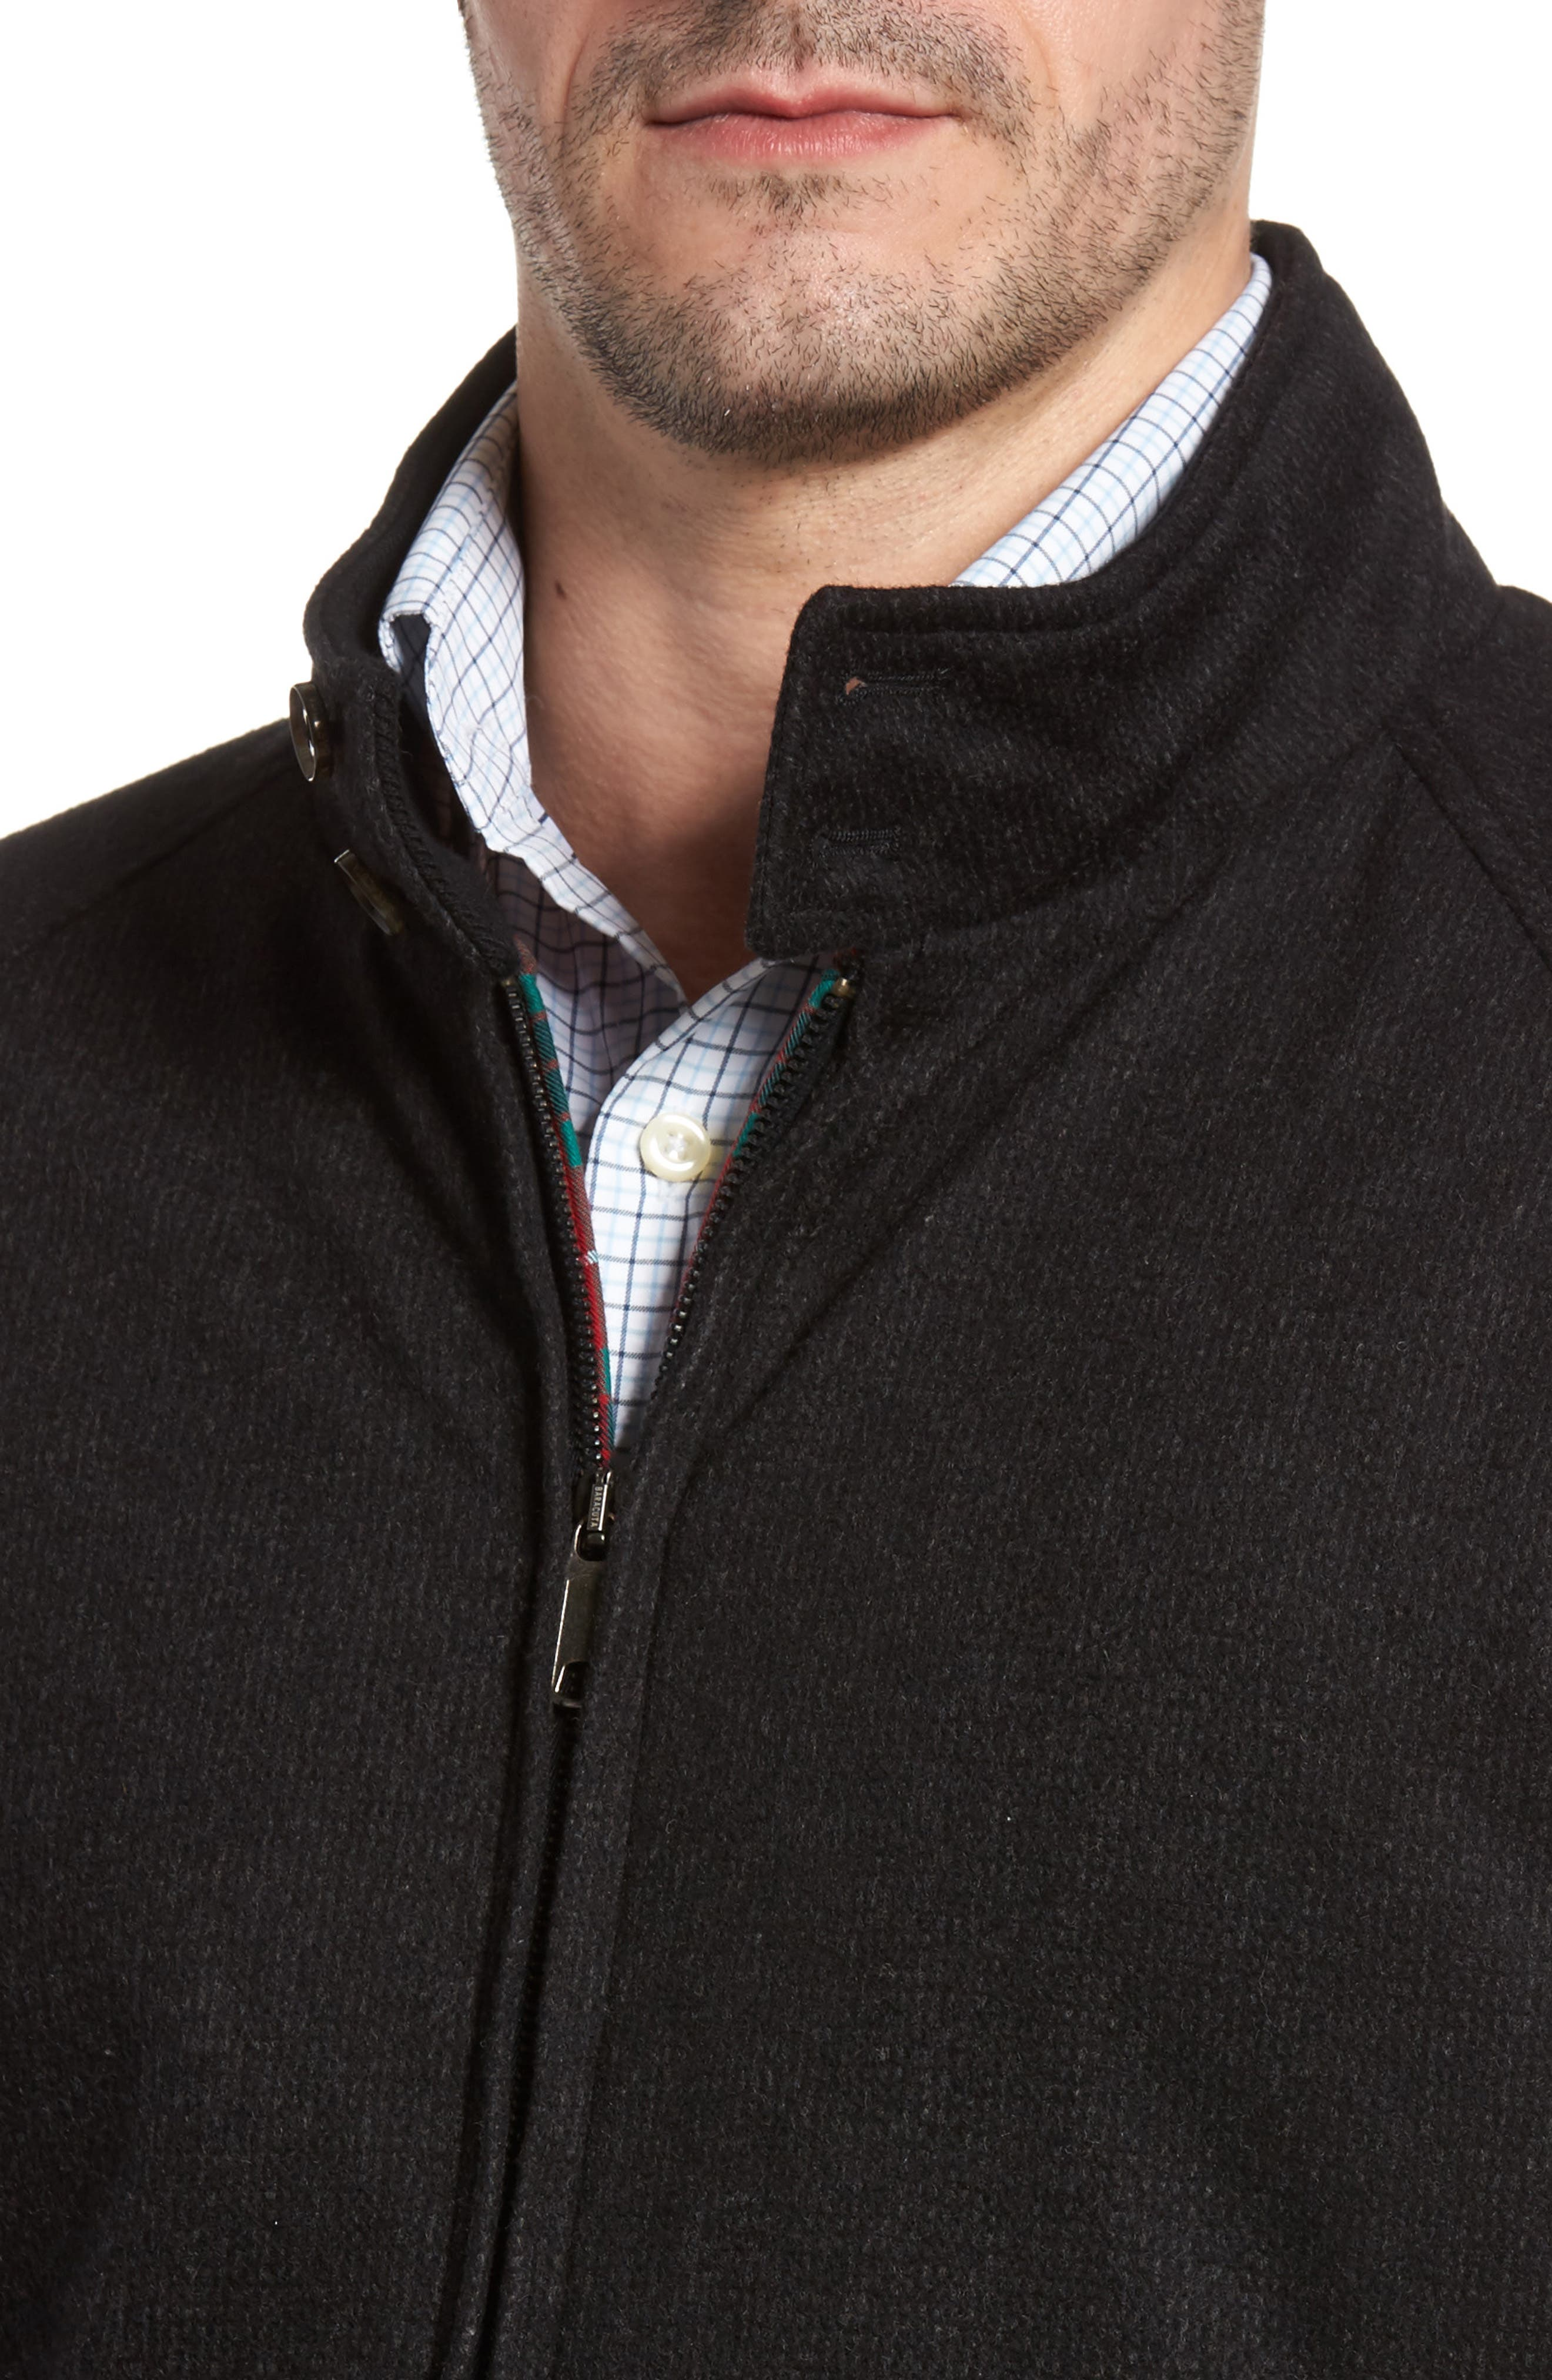 G9 Waterproof Wool Blend Harrington Jacket,                             Alternate thumbnail 4, color,                             020